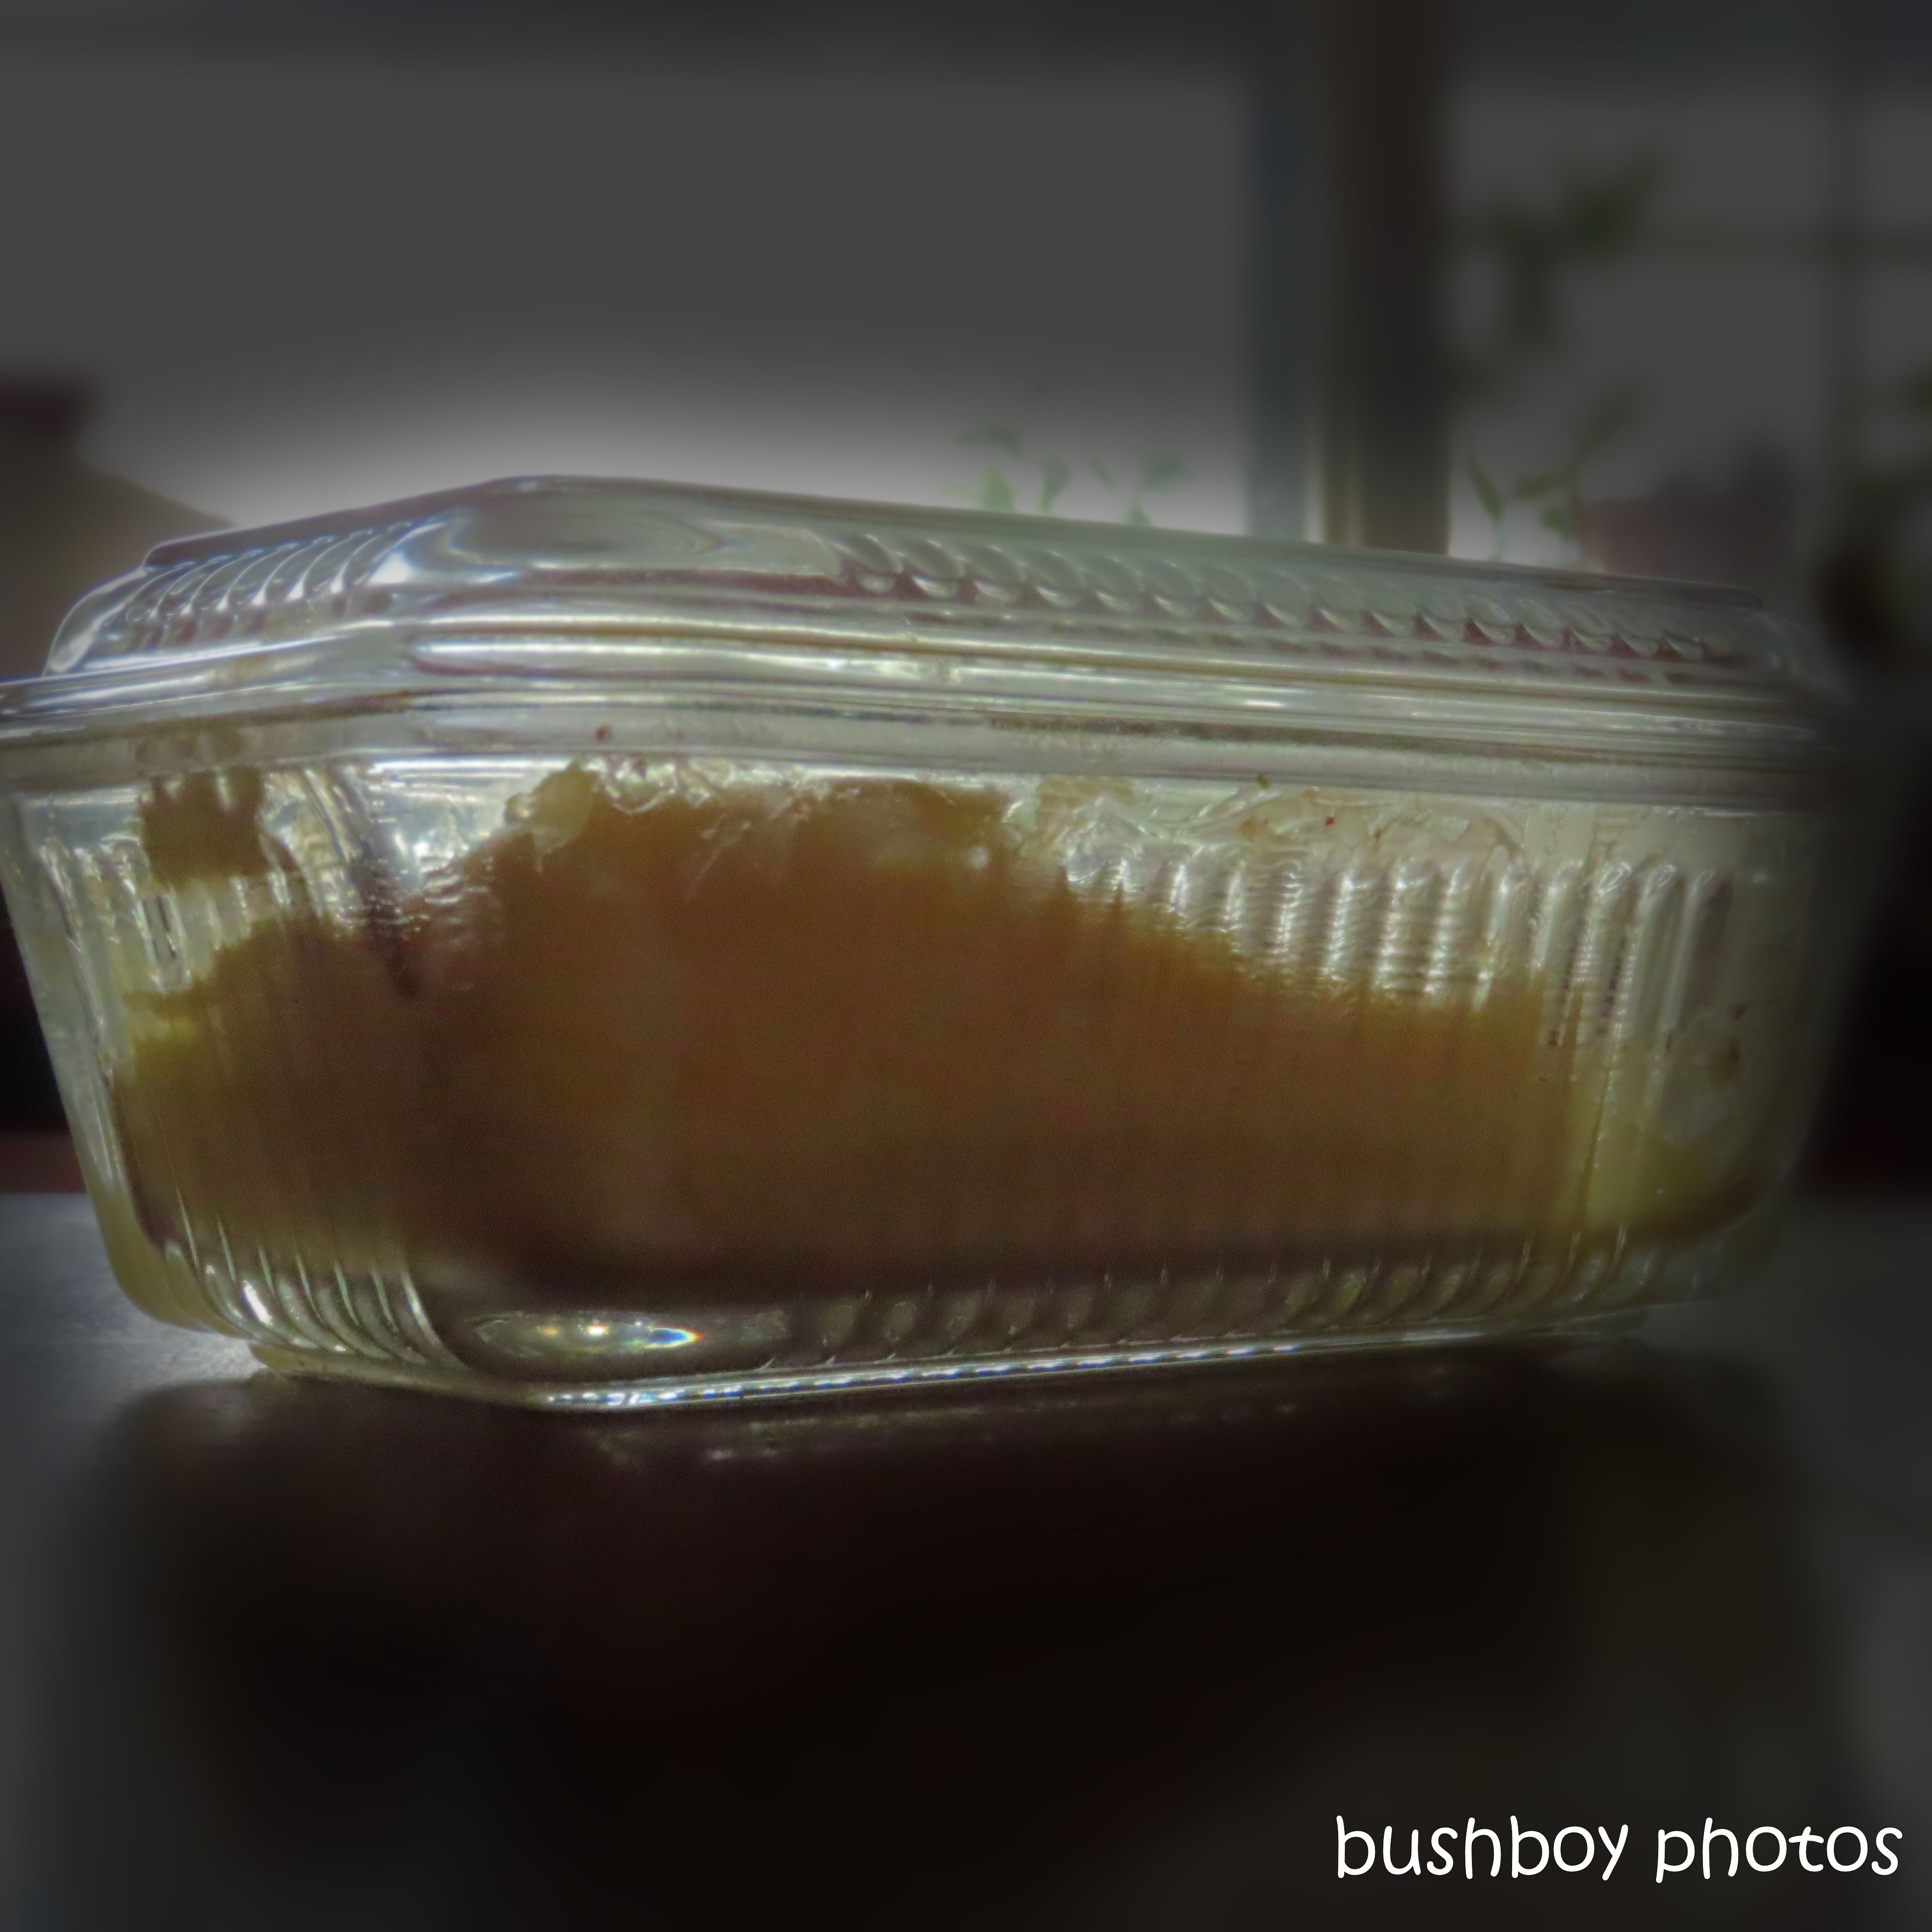 191023_blog_challenge_butter_breakfast_dish1